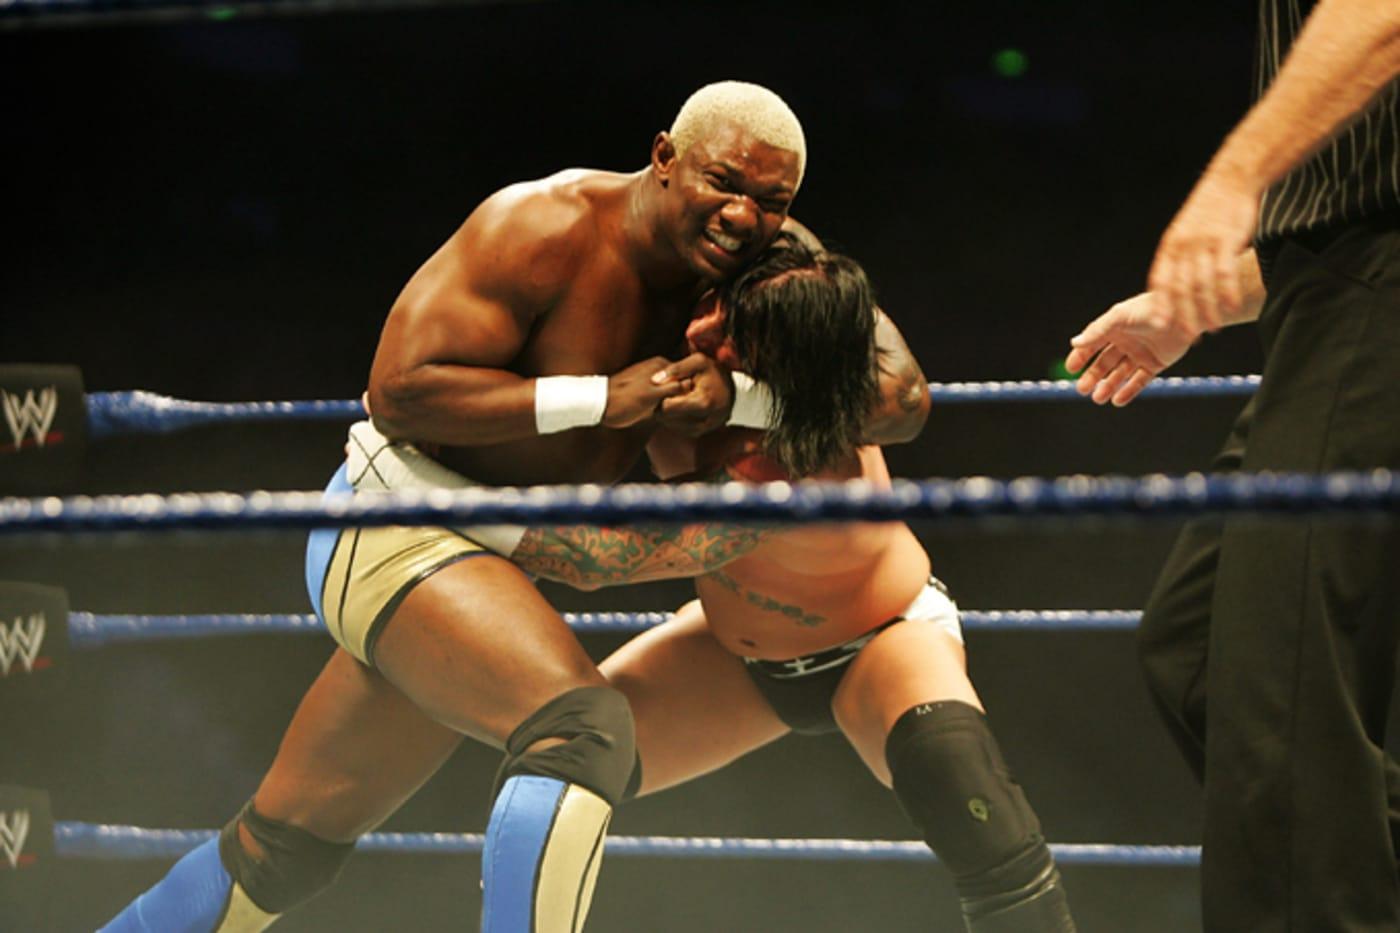 Shelton Benjamin puts CM Punk into a headlock during WWE Smackdown